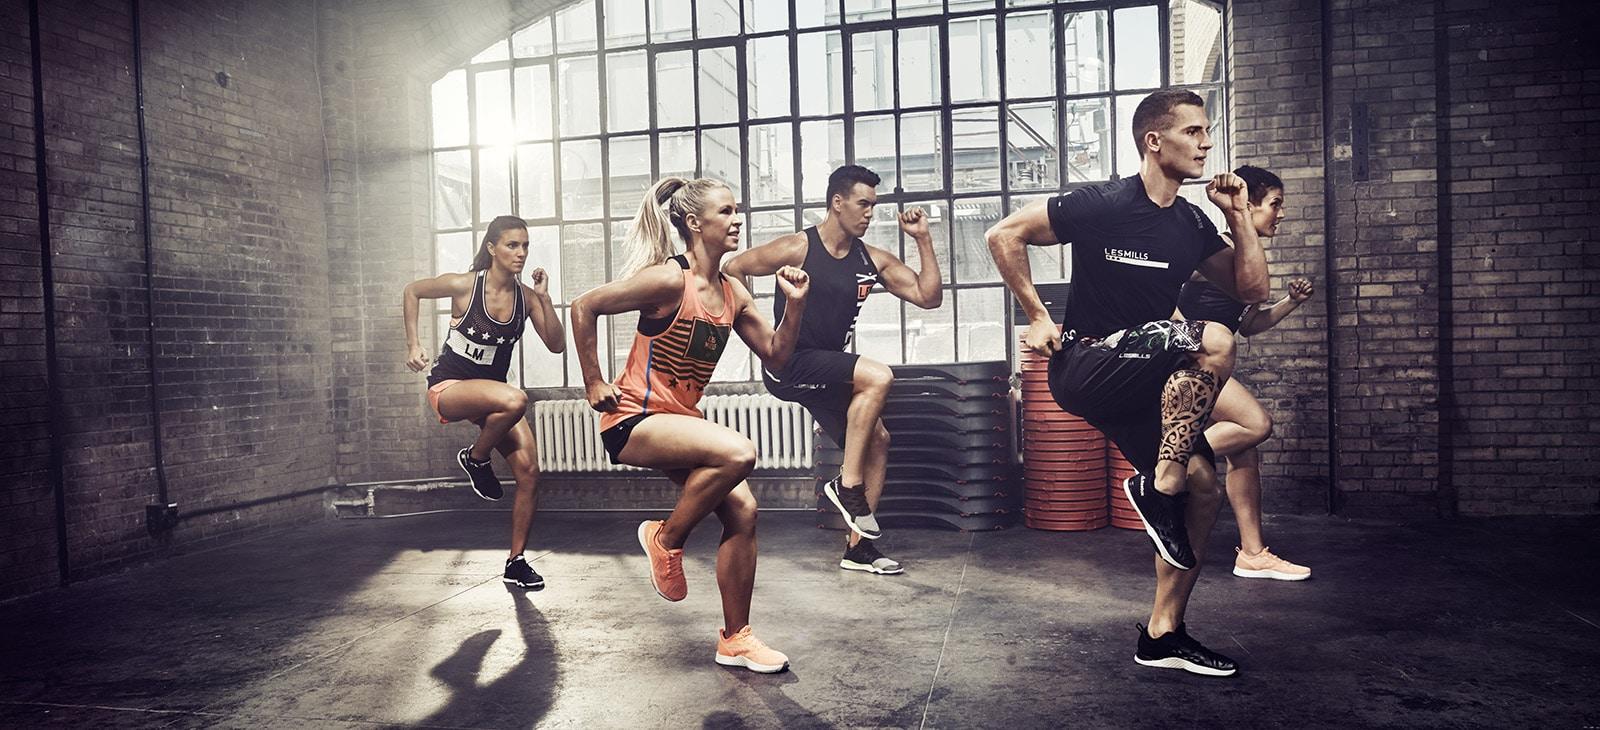 Kurs Bodyattack im Fitness-Loft